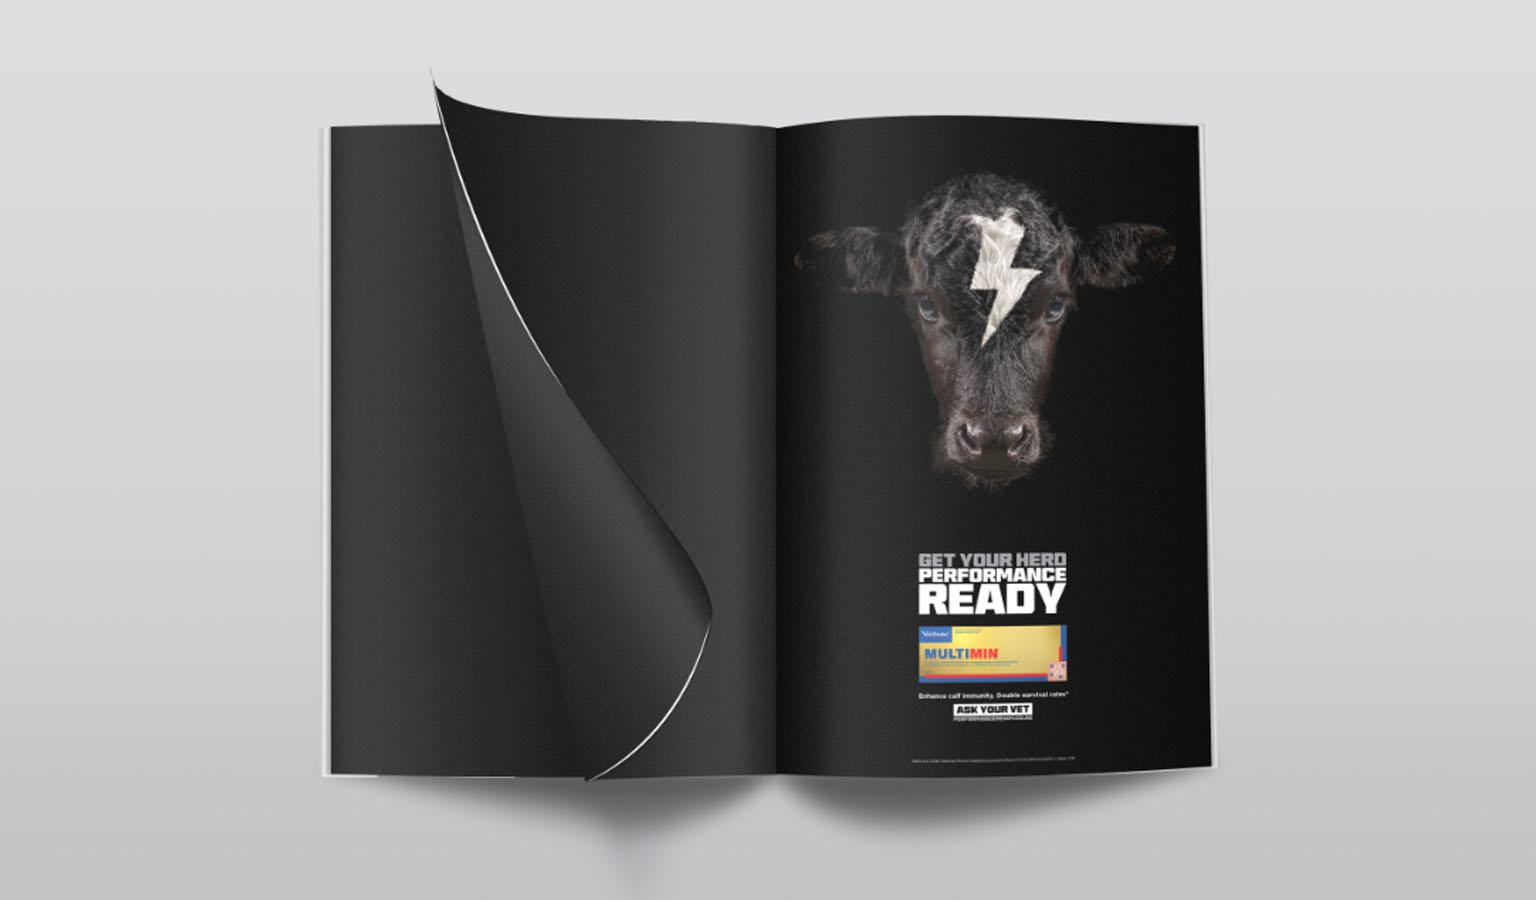 virbac magazine ad design